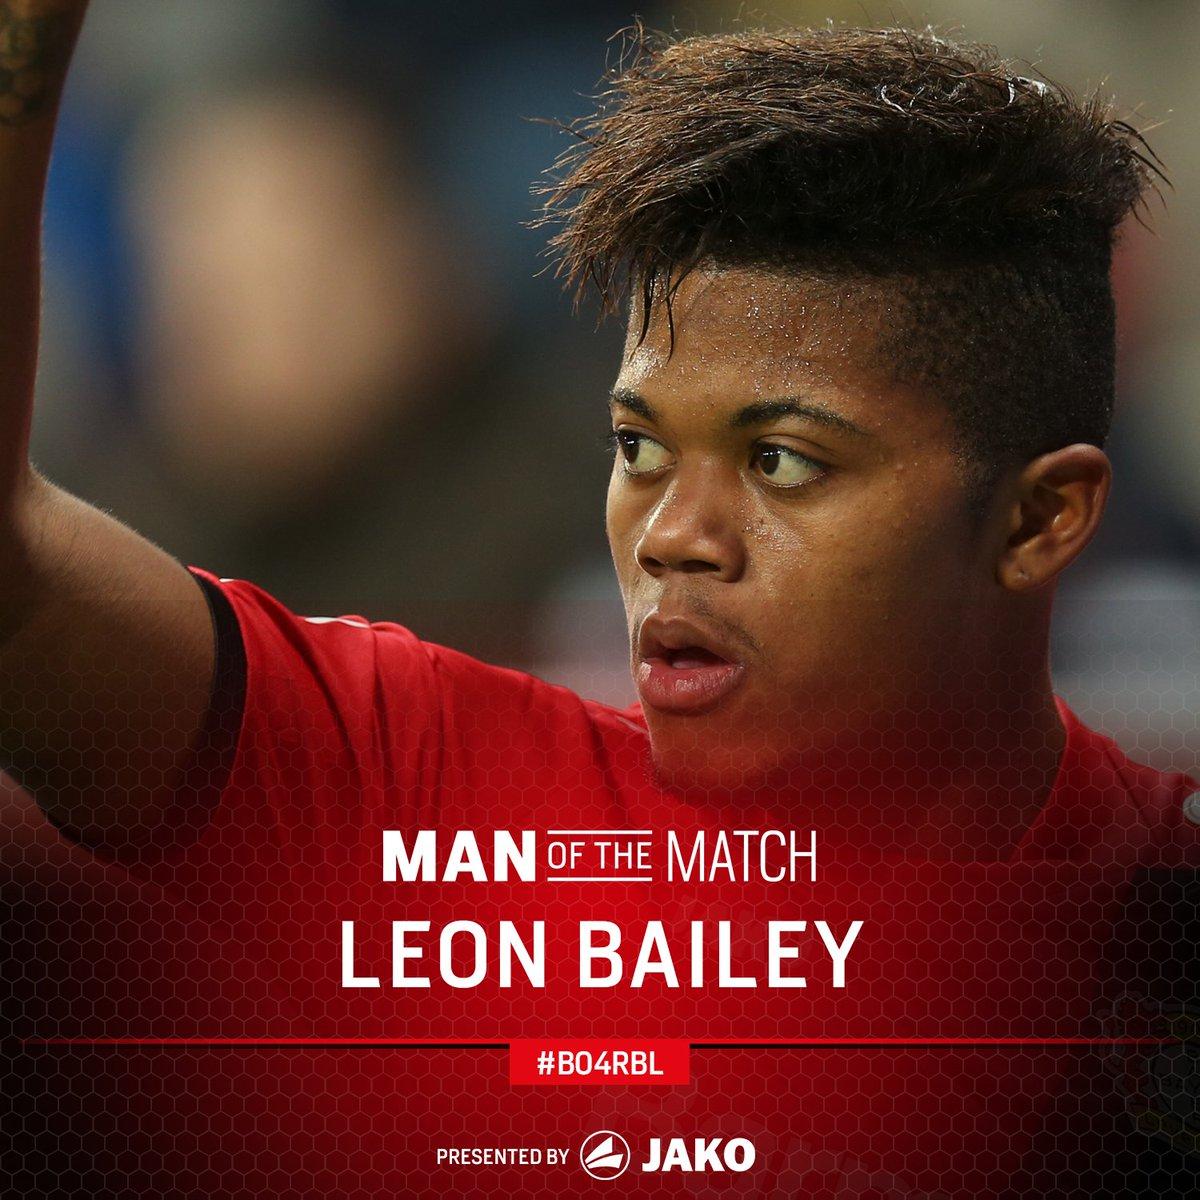 RT @bayer04_en: Your Man of the Match for #B04RBL...  ... @leonbailey! https://t.co/nq8oxGERdw